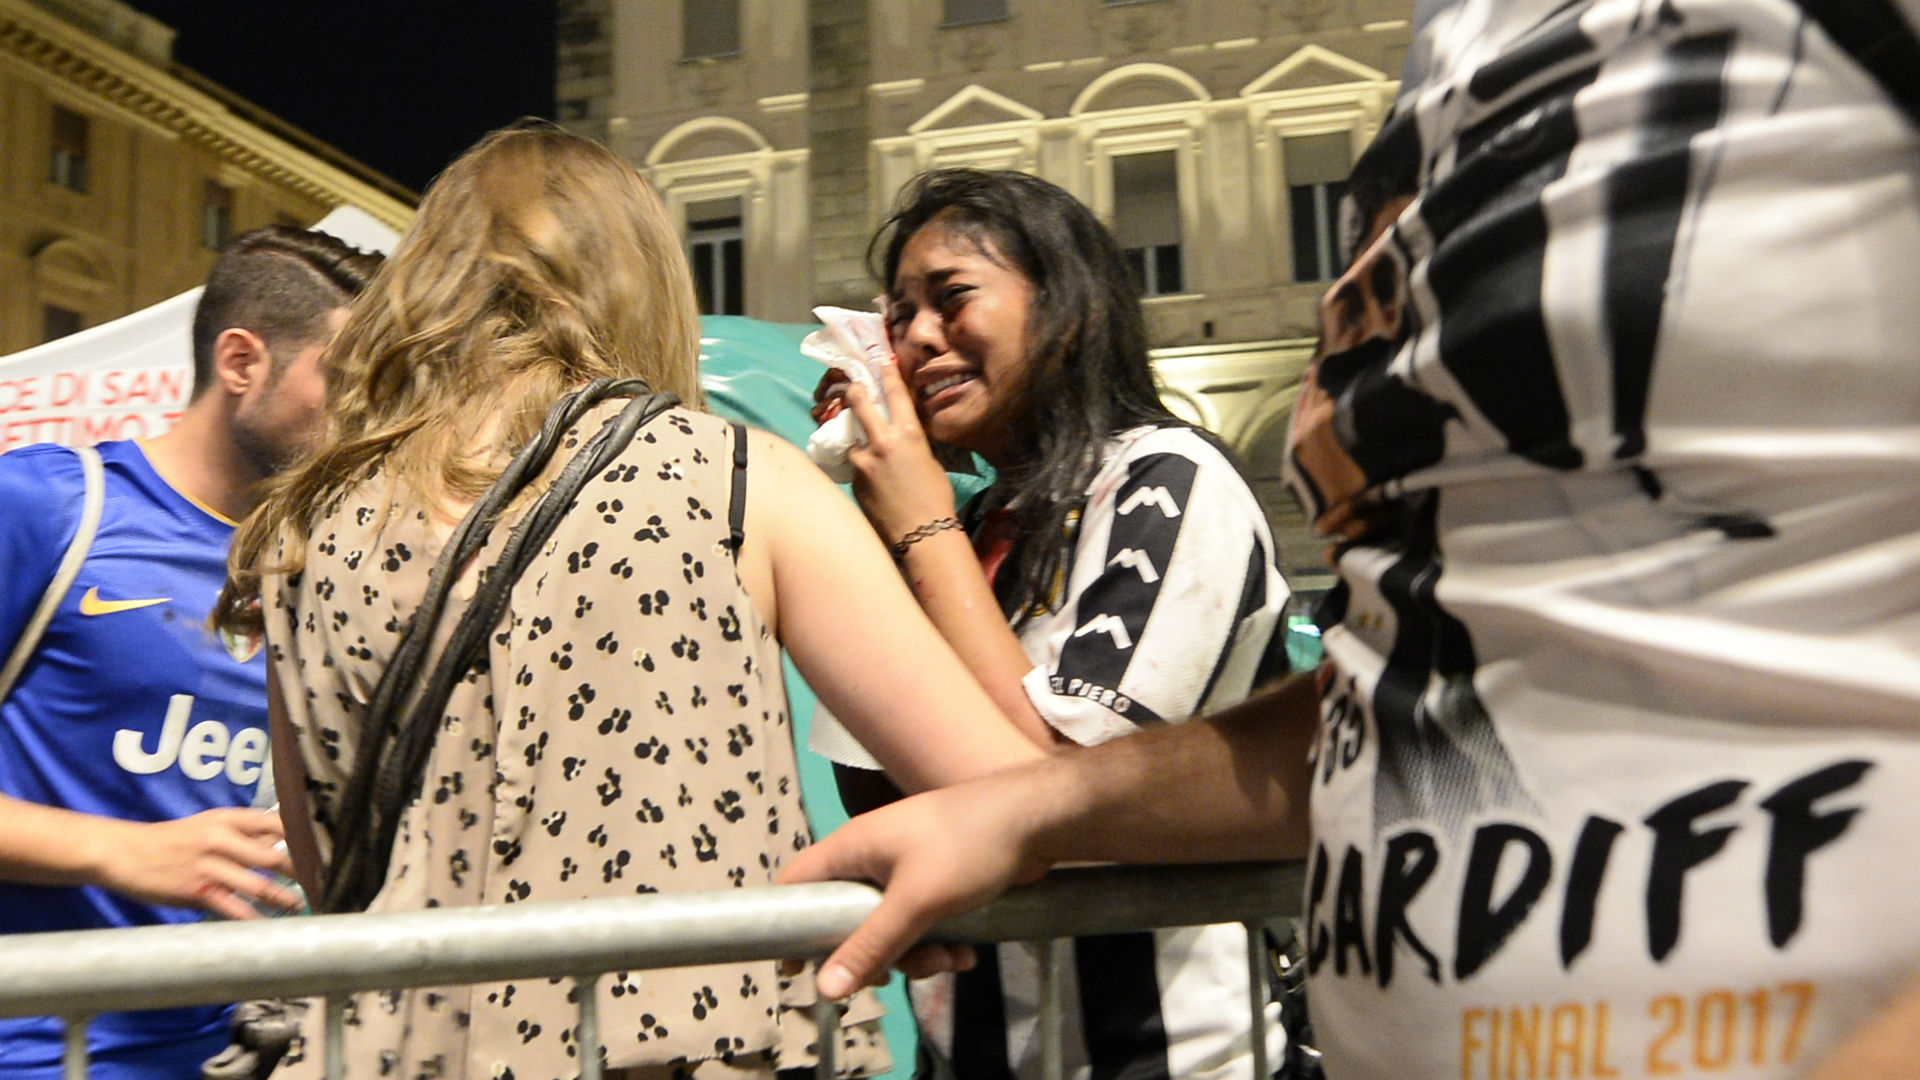 Juventus fans Turin Champions League final